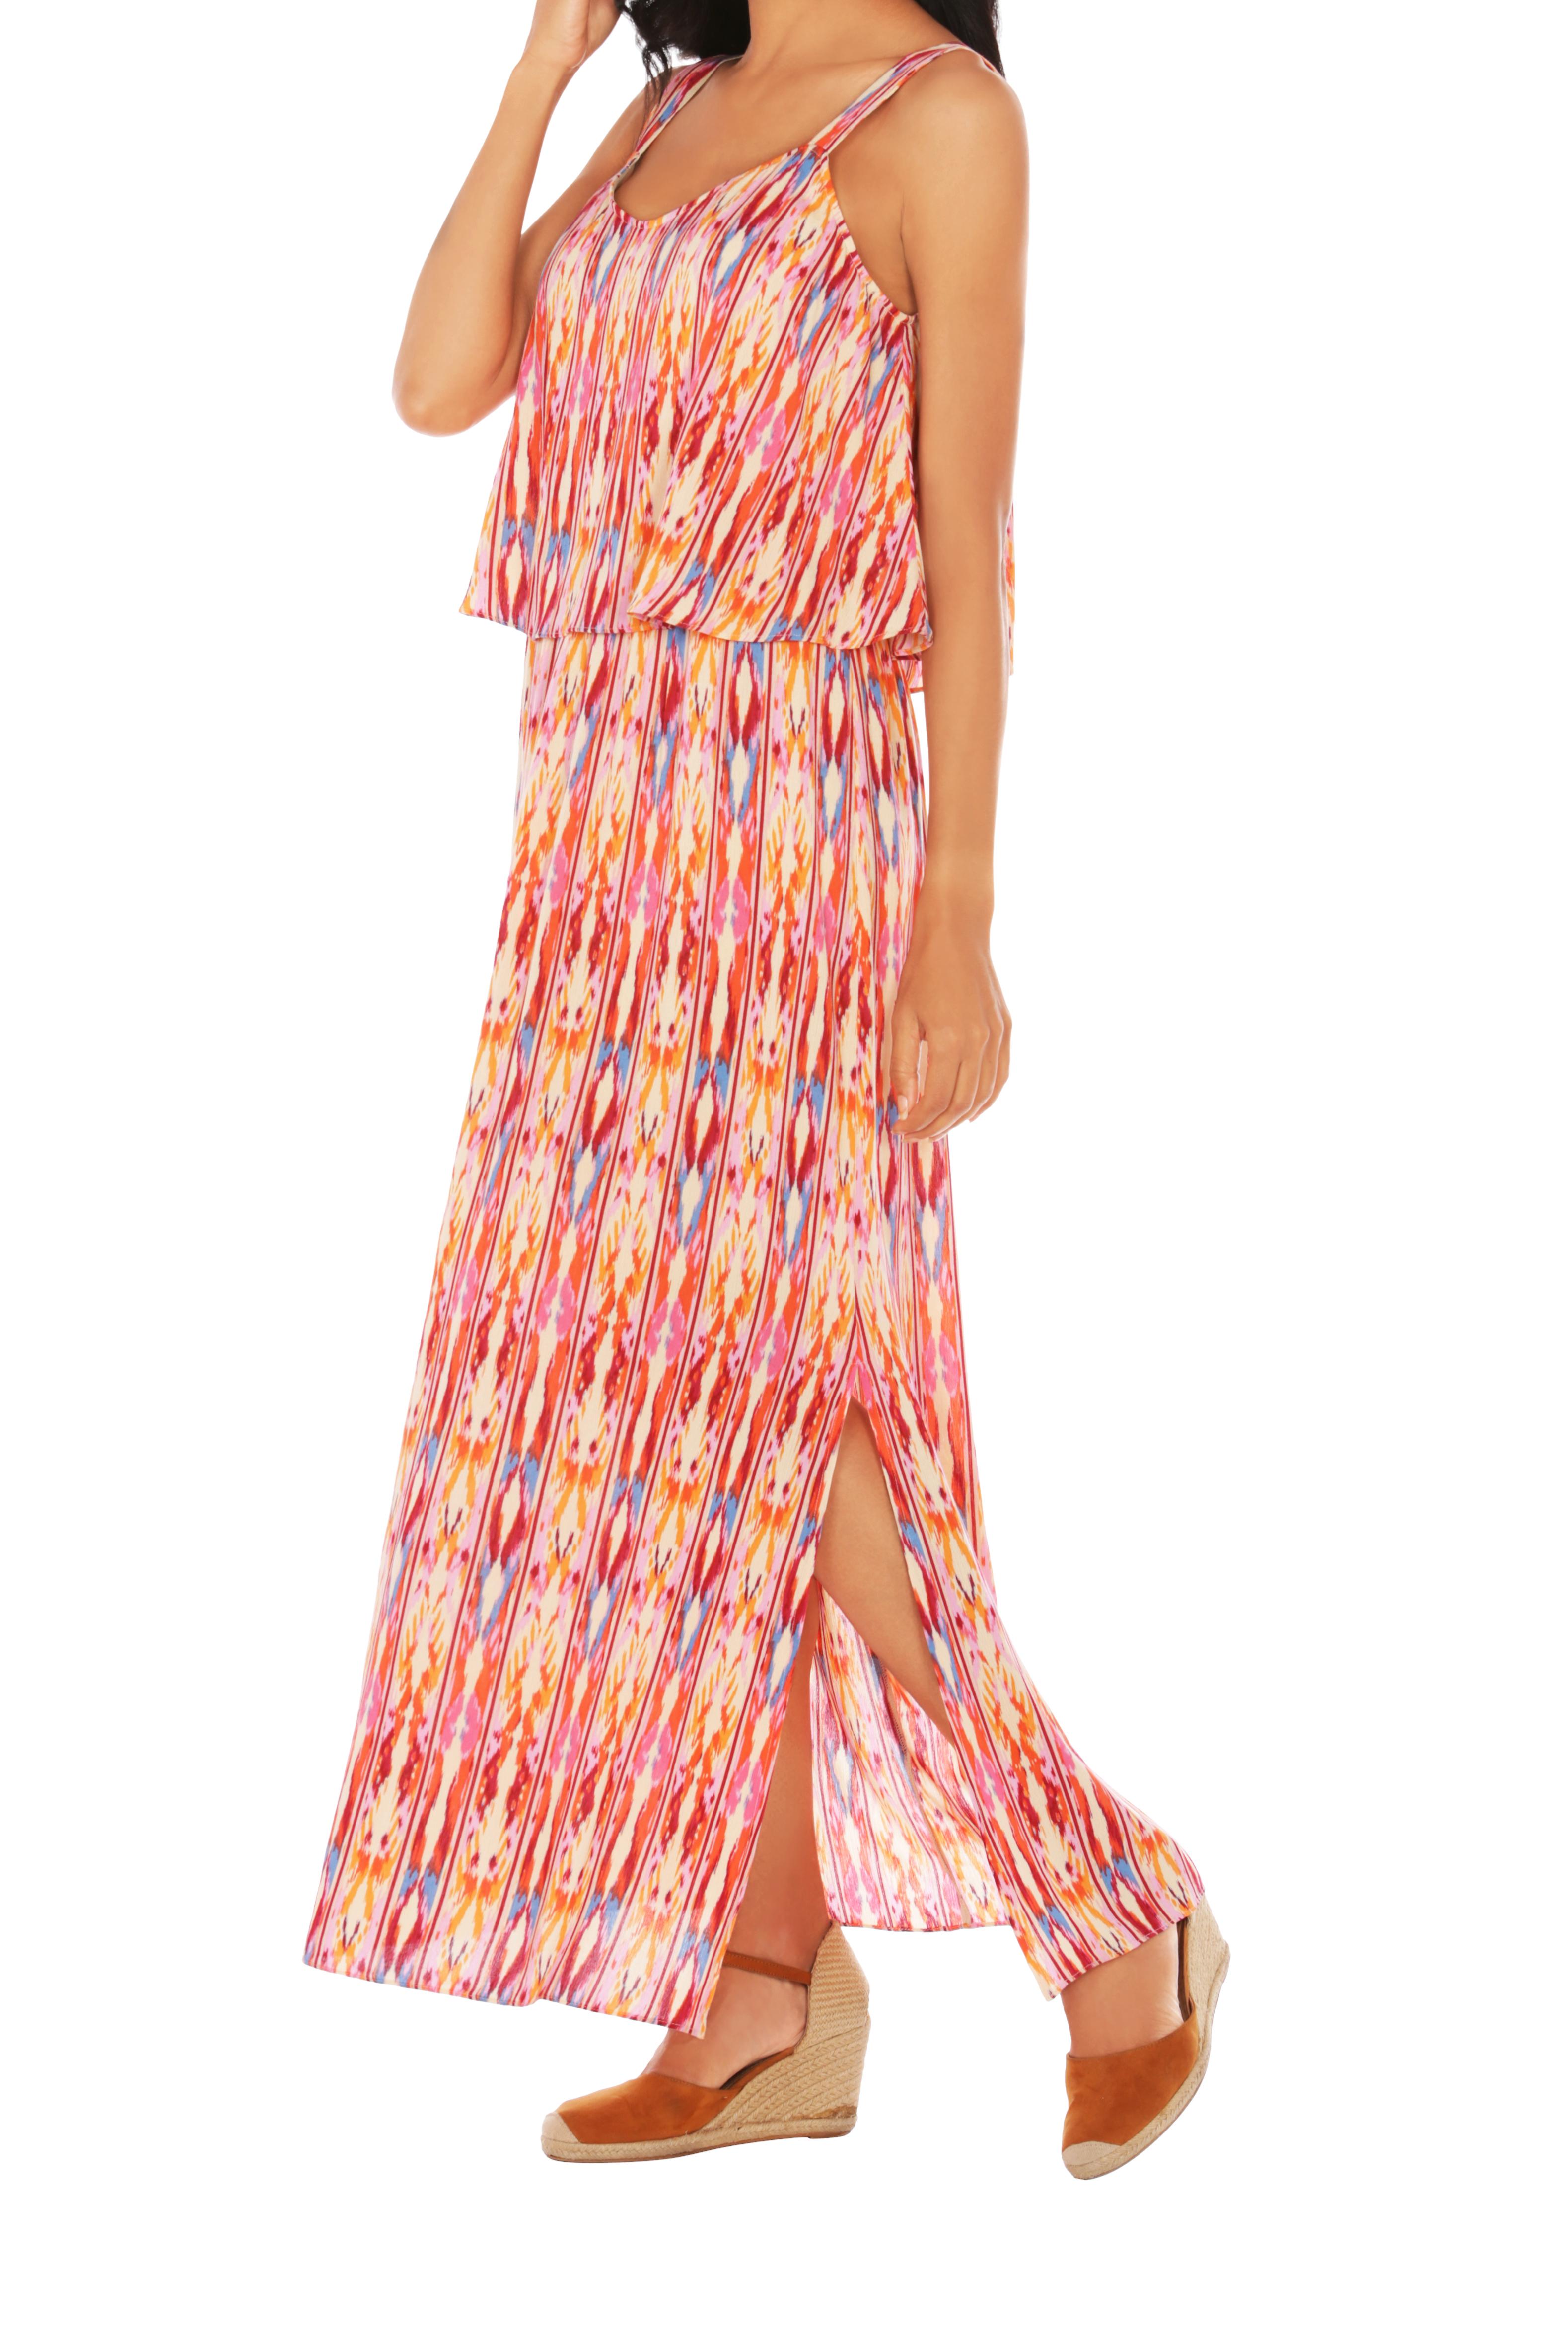 Caribbean Joe® Double Layer Maxi Dress -Bittersweet - Front